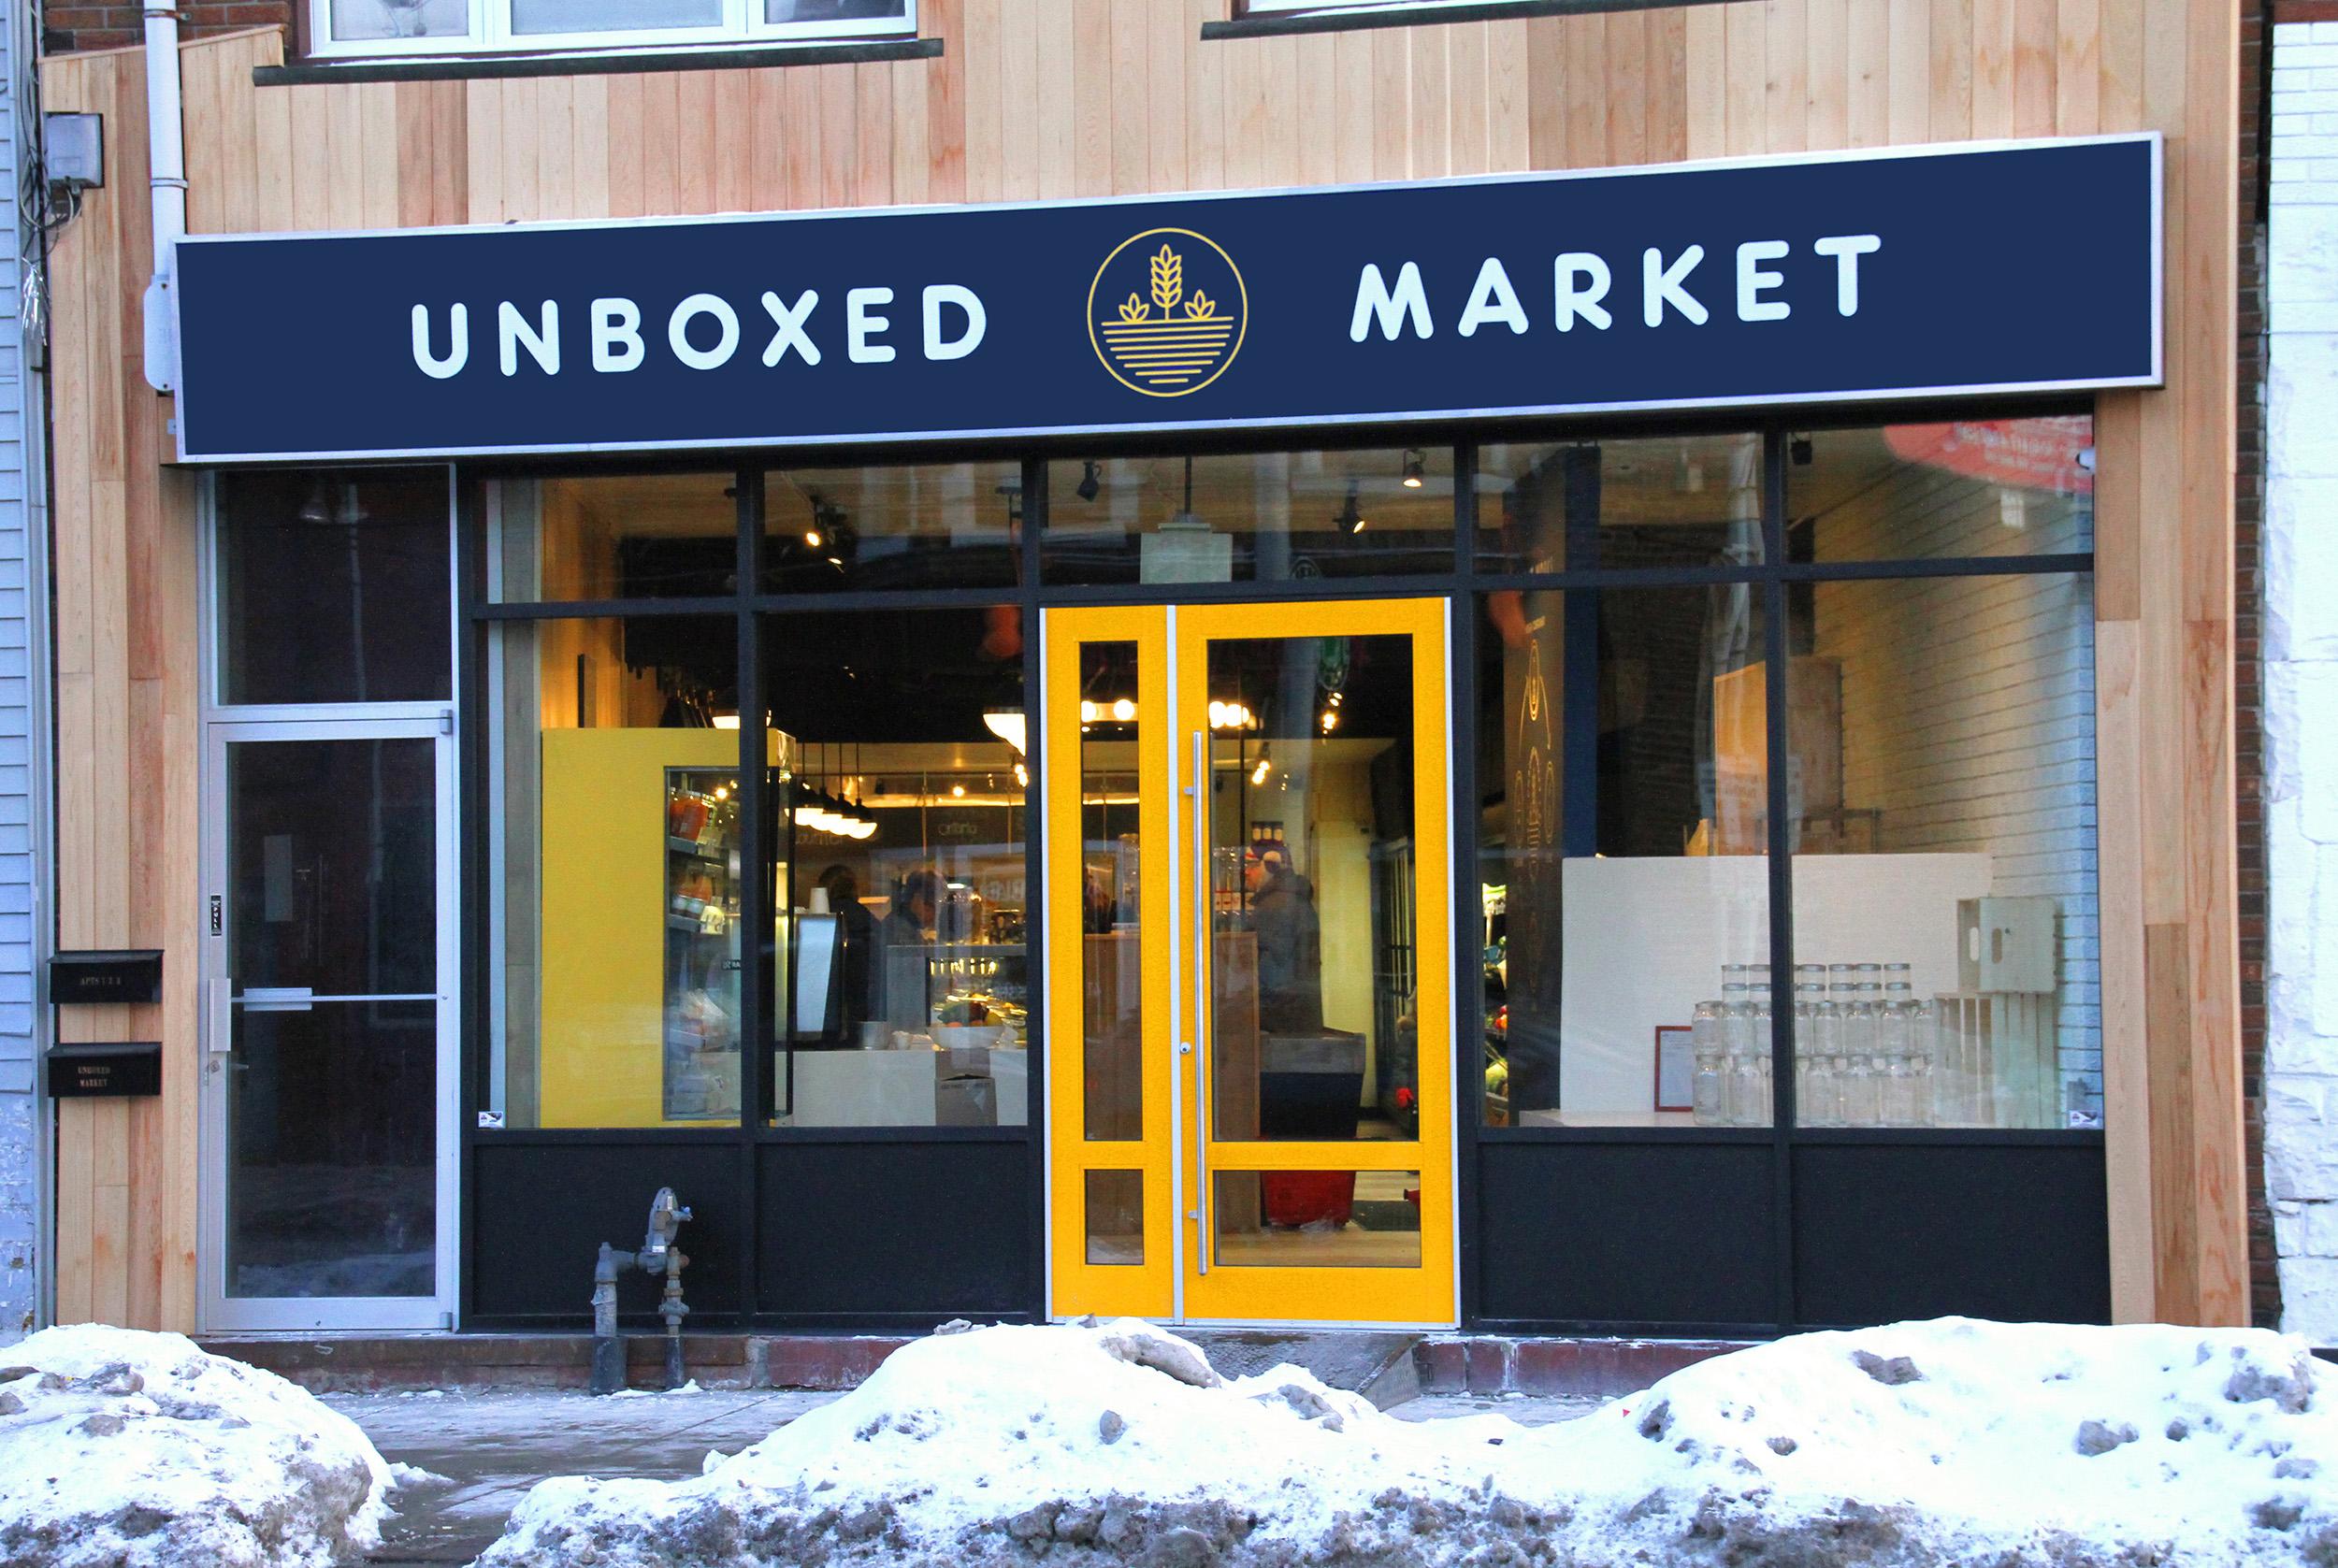 Unboxed-Market-Shop-Exterior.jpg